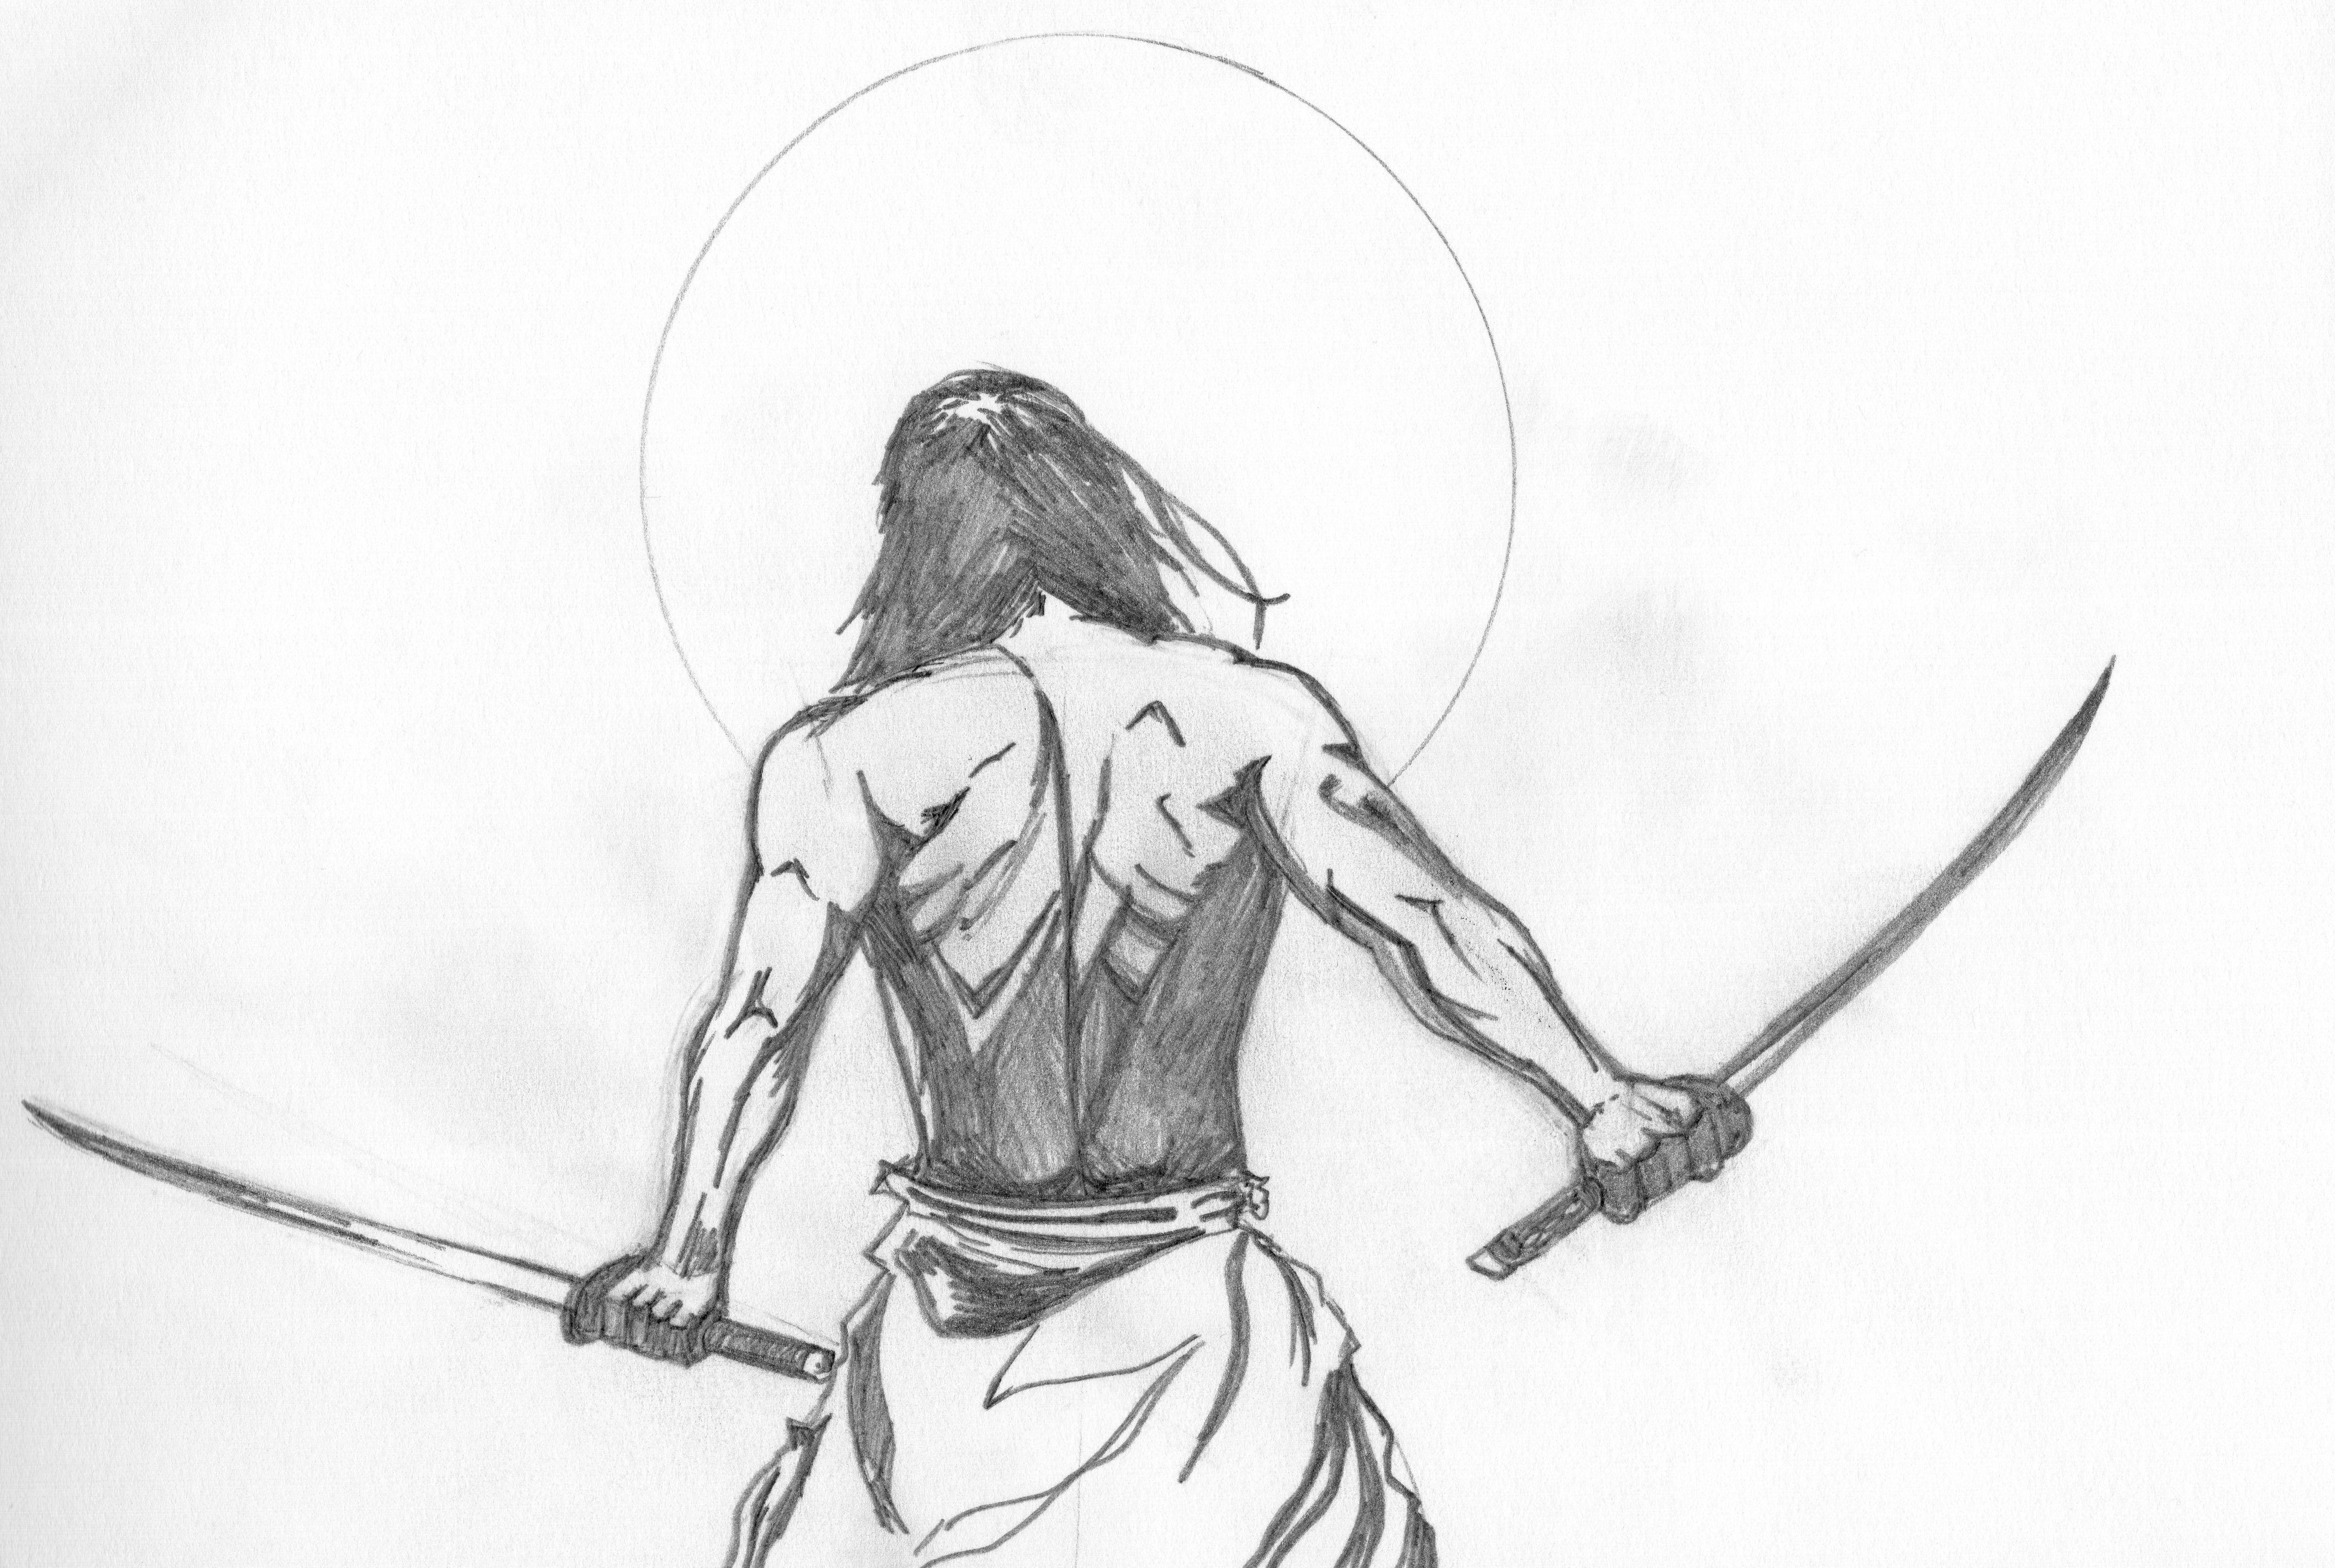 Ninja pencil drawing